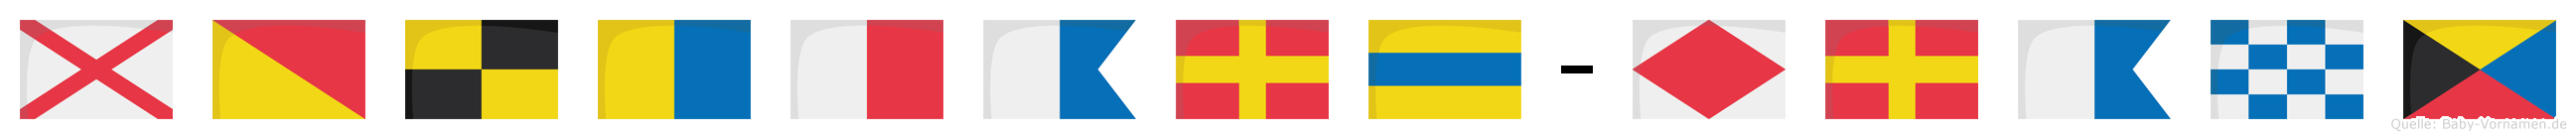 Volkhard-Franz im Flaggenalphabet